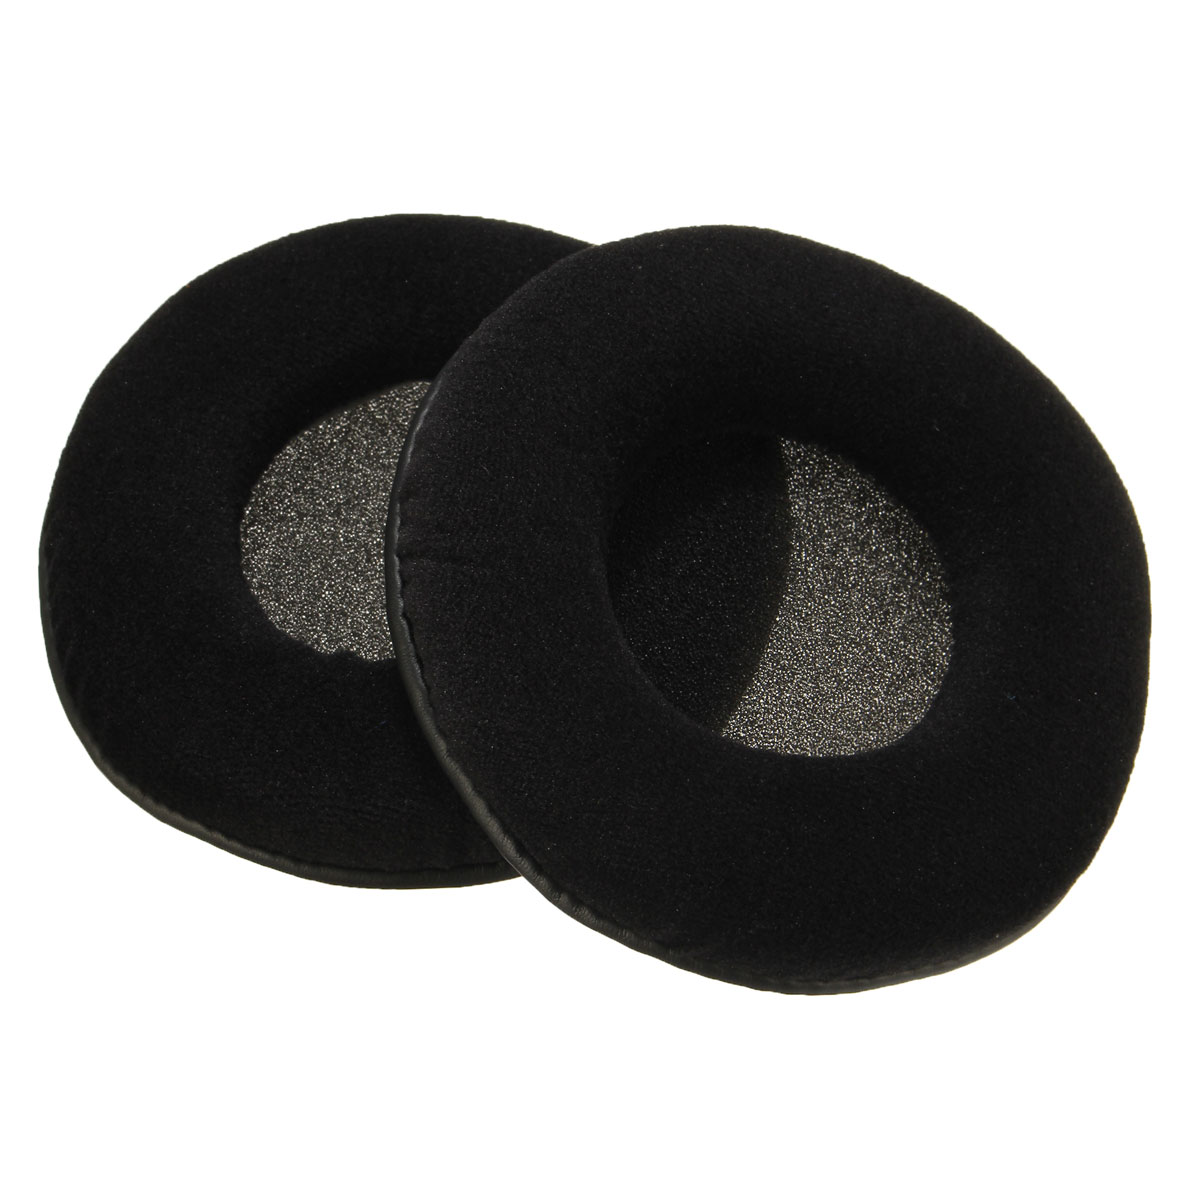 Universal Velour Replacement Ear Cushion Pad Earpad Soft Care Headphones Pro For AKG K240 Studio K240MKII K270 K271 K271S K272